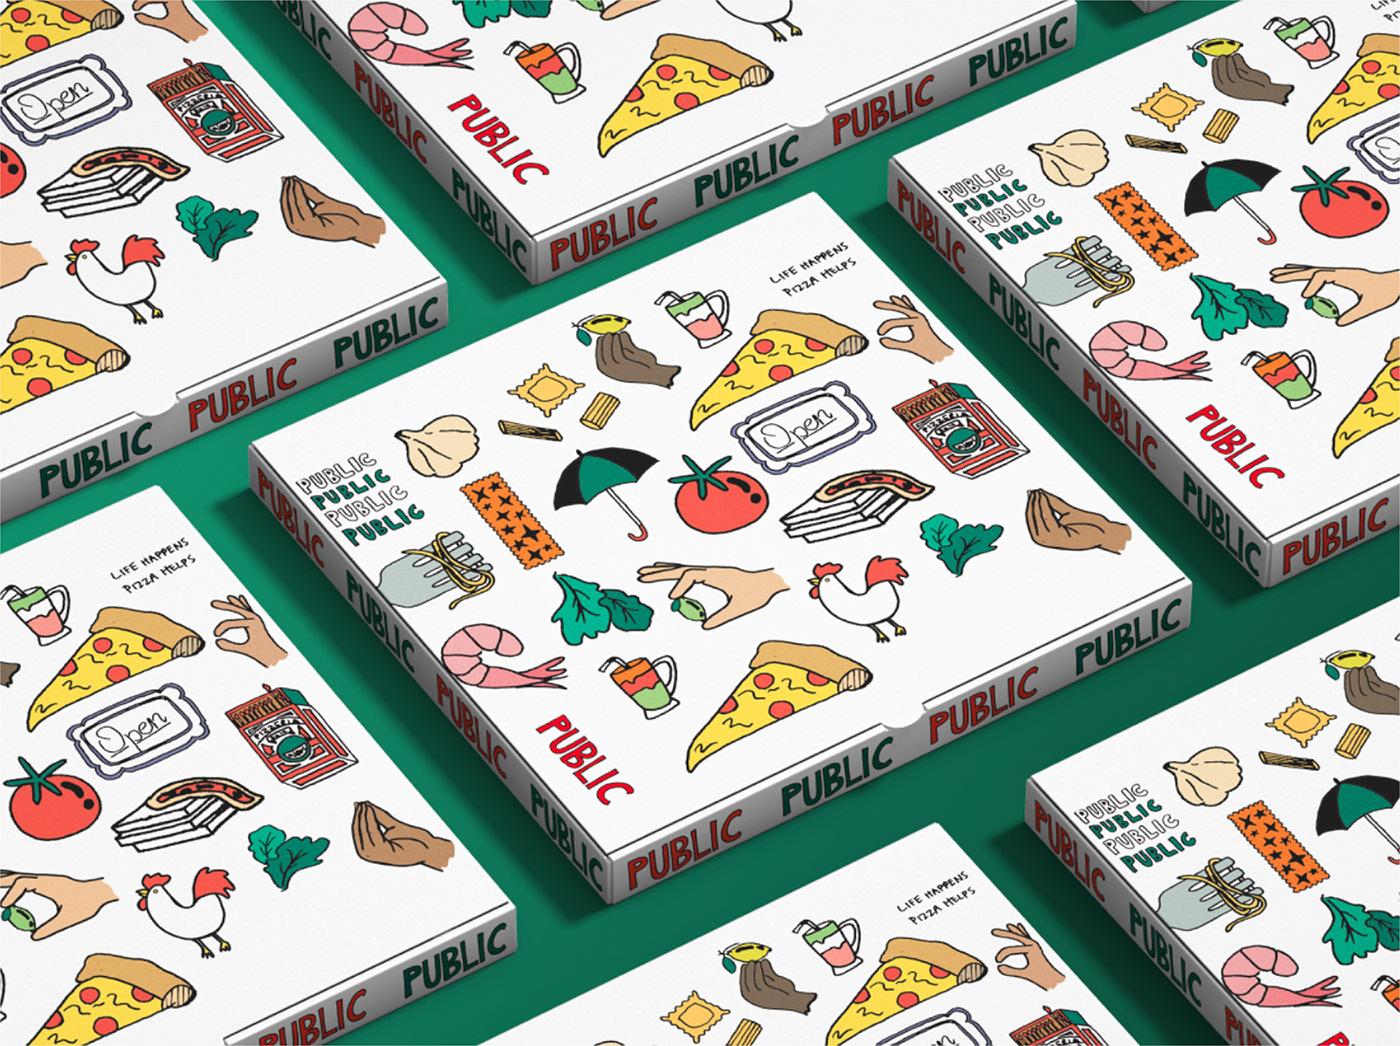 branding  design Food  graphic design  identity ILLUSTRATION  Pizza restaurant